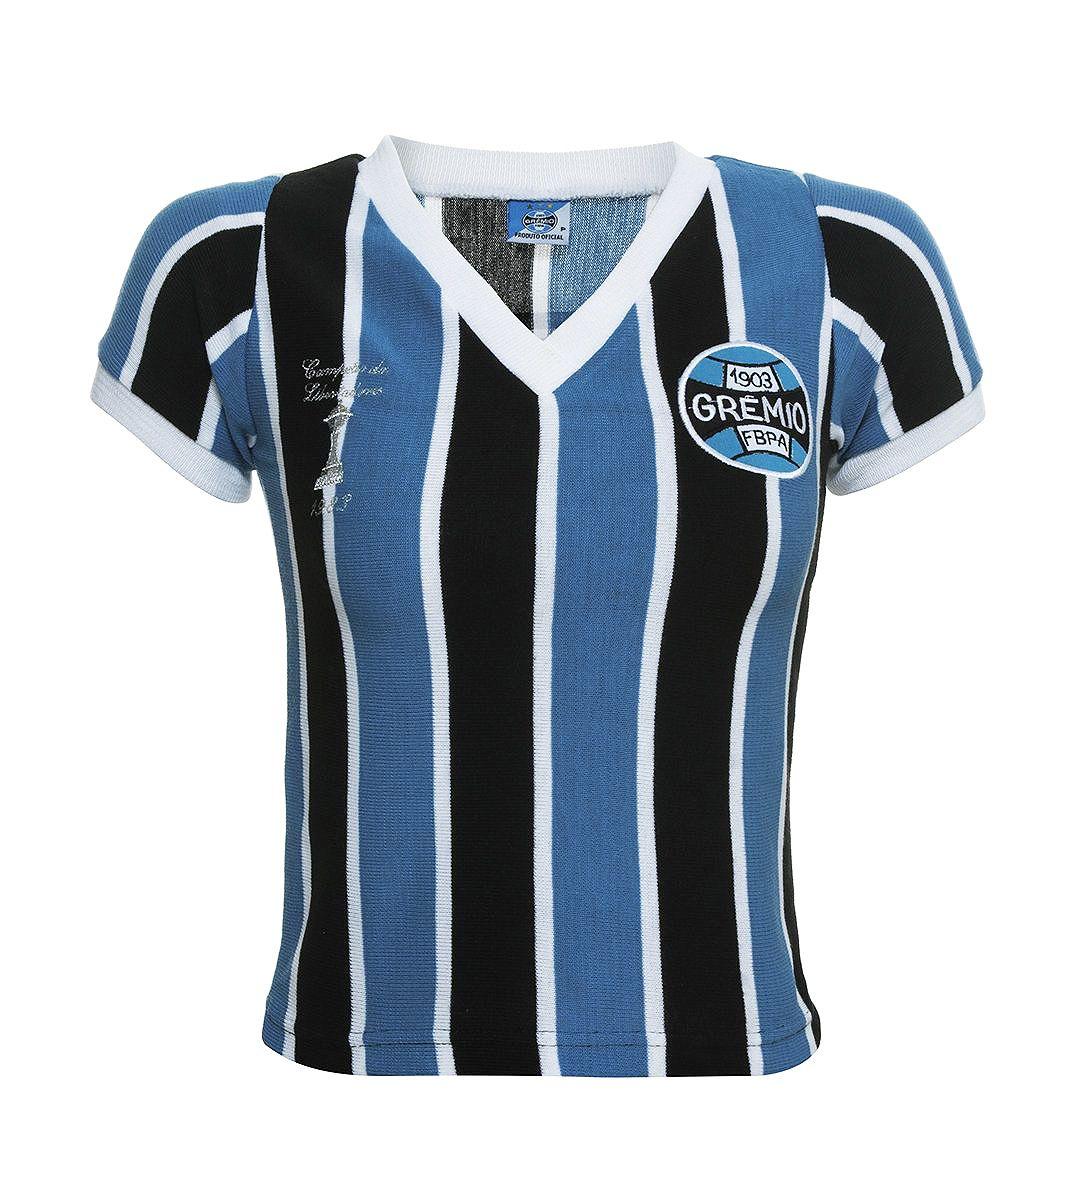 Camisa Retrô Grêmio 1983 Infantil Feminina